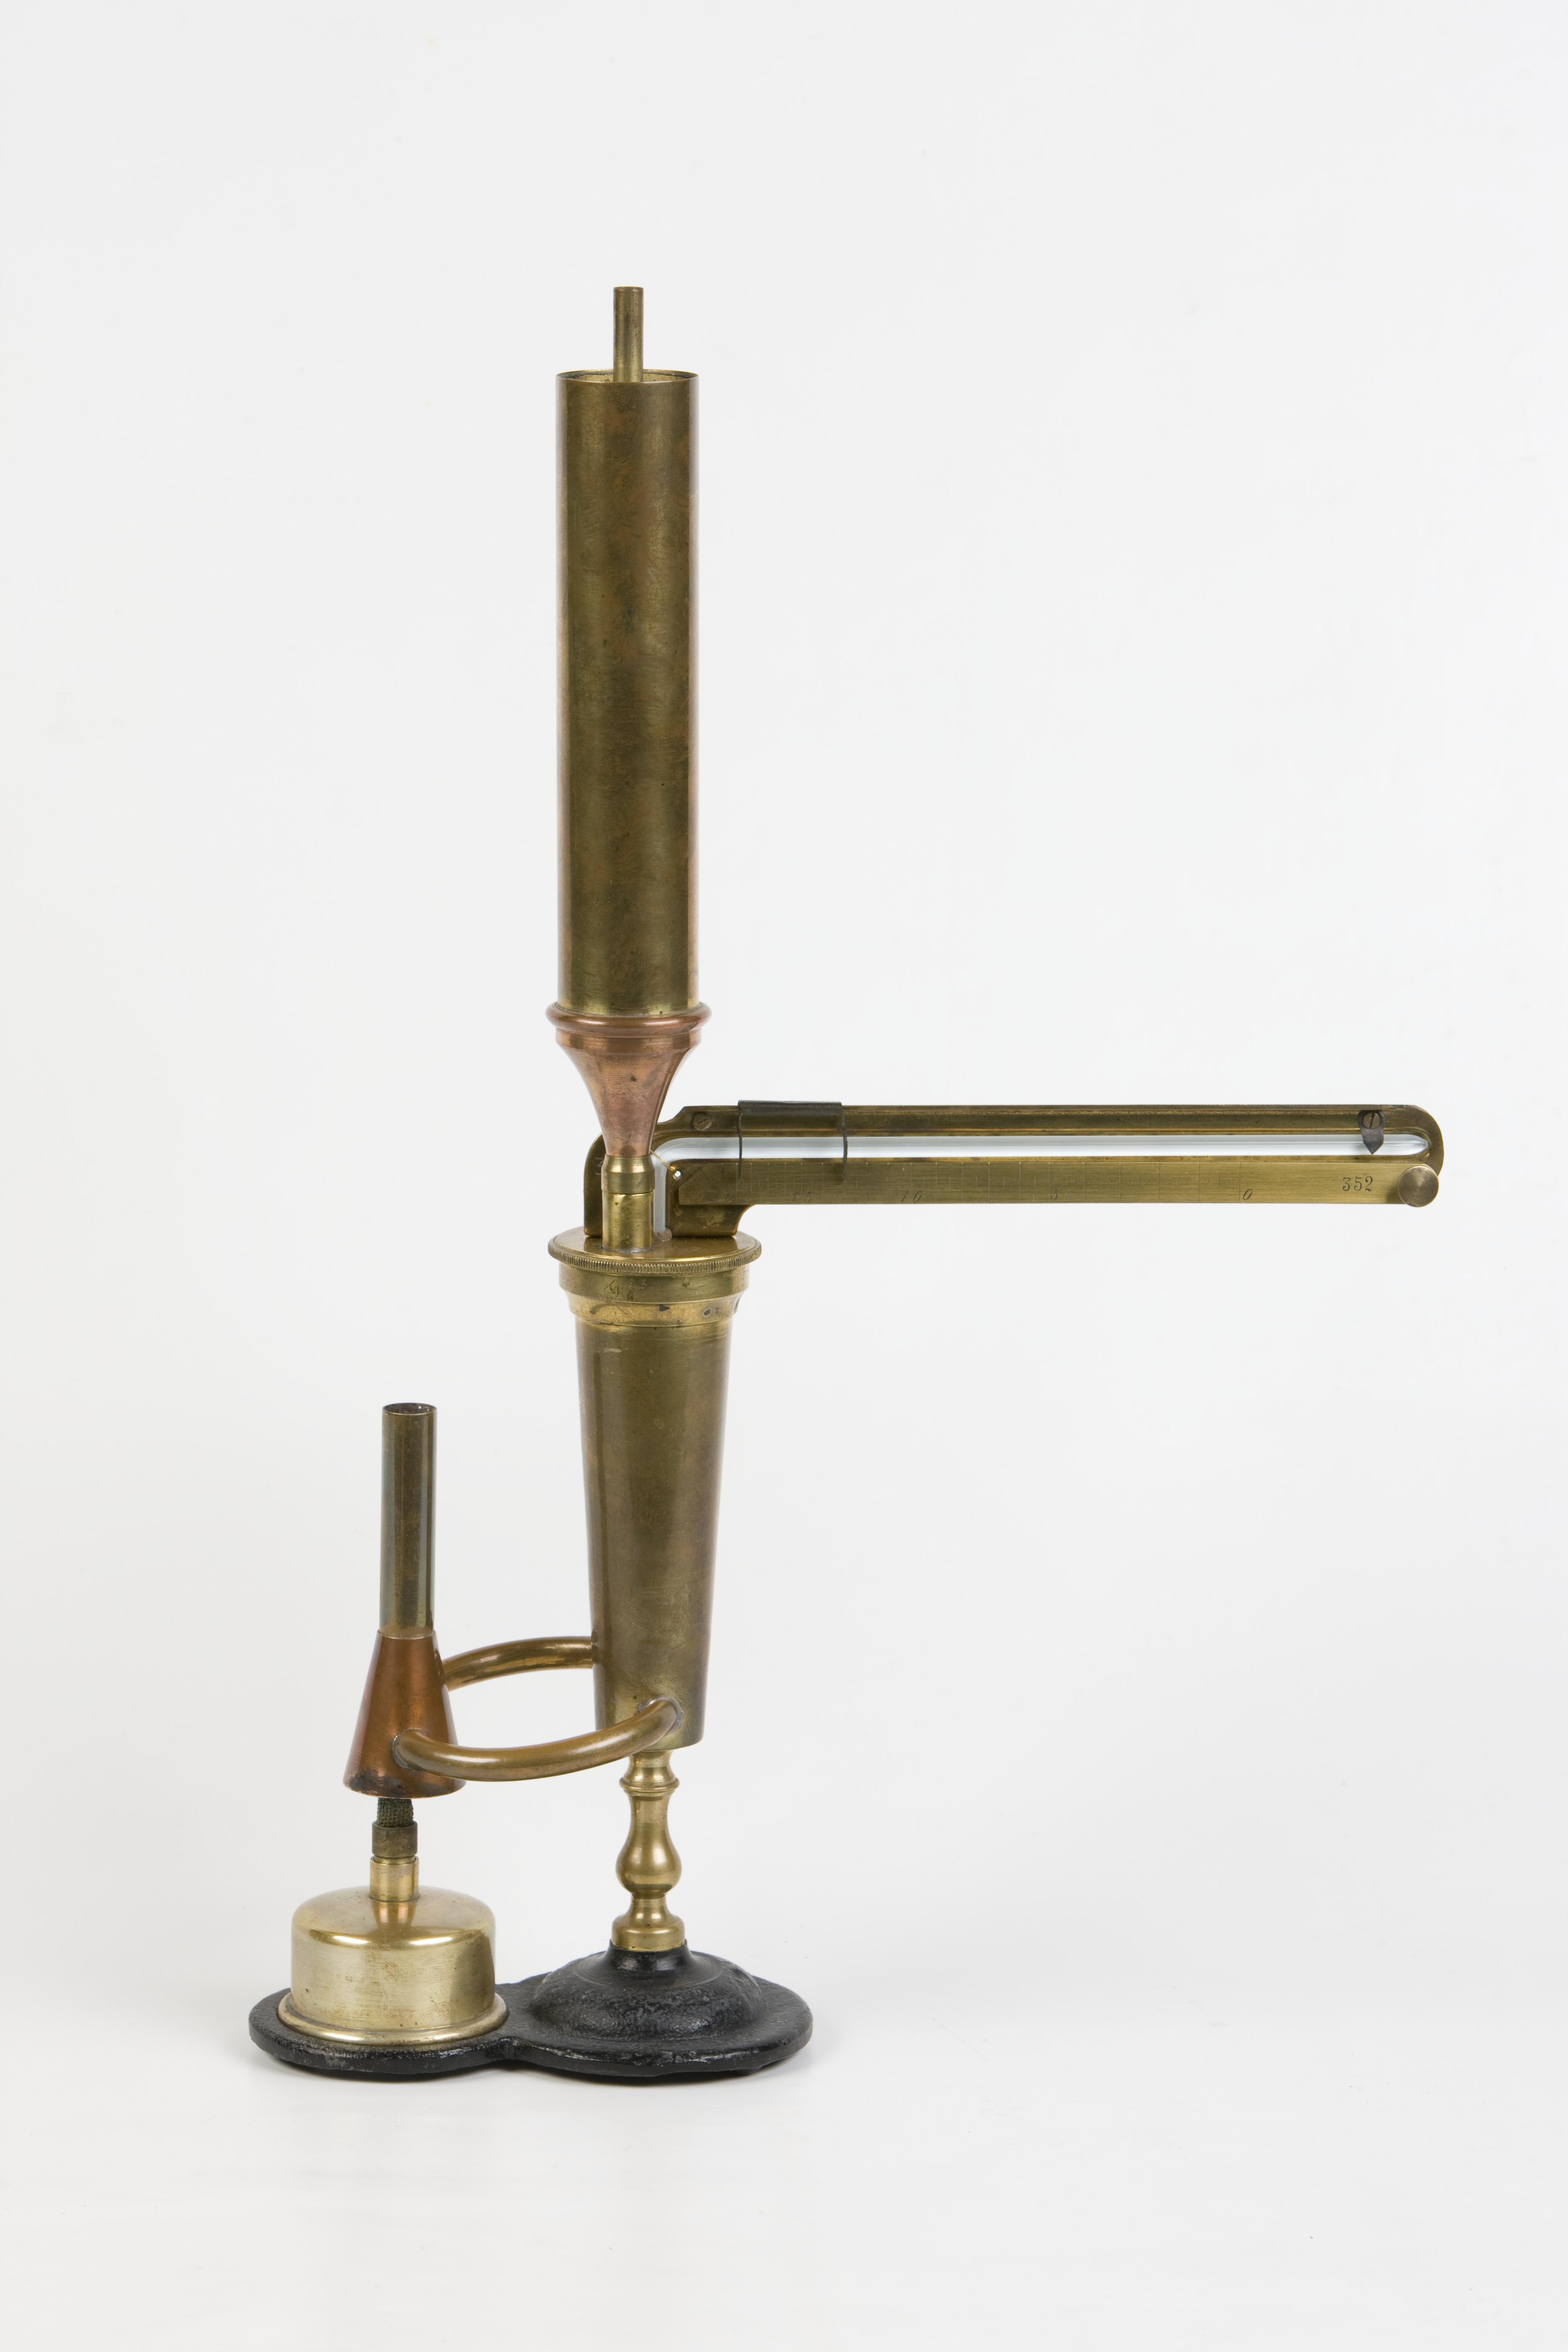 7- Ebullioscopio di Malligand